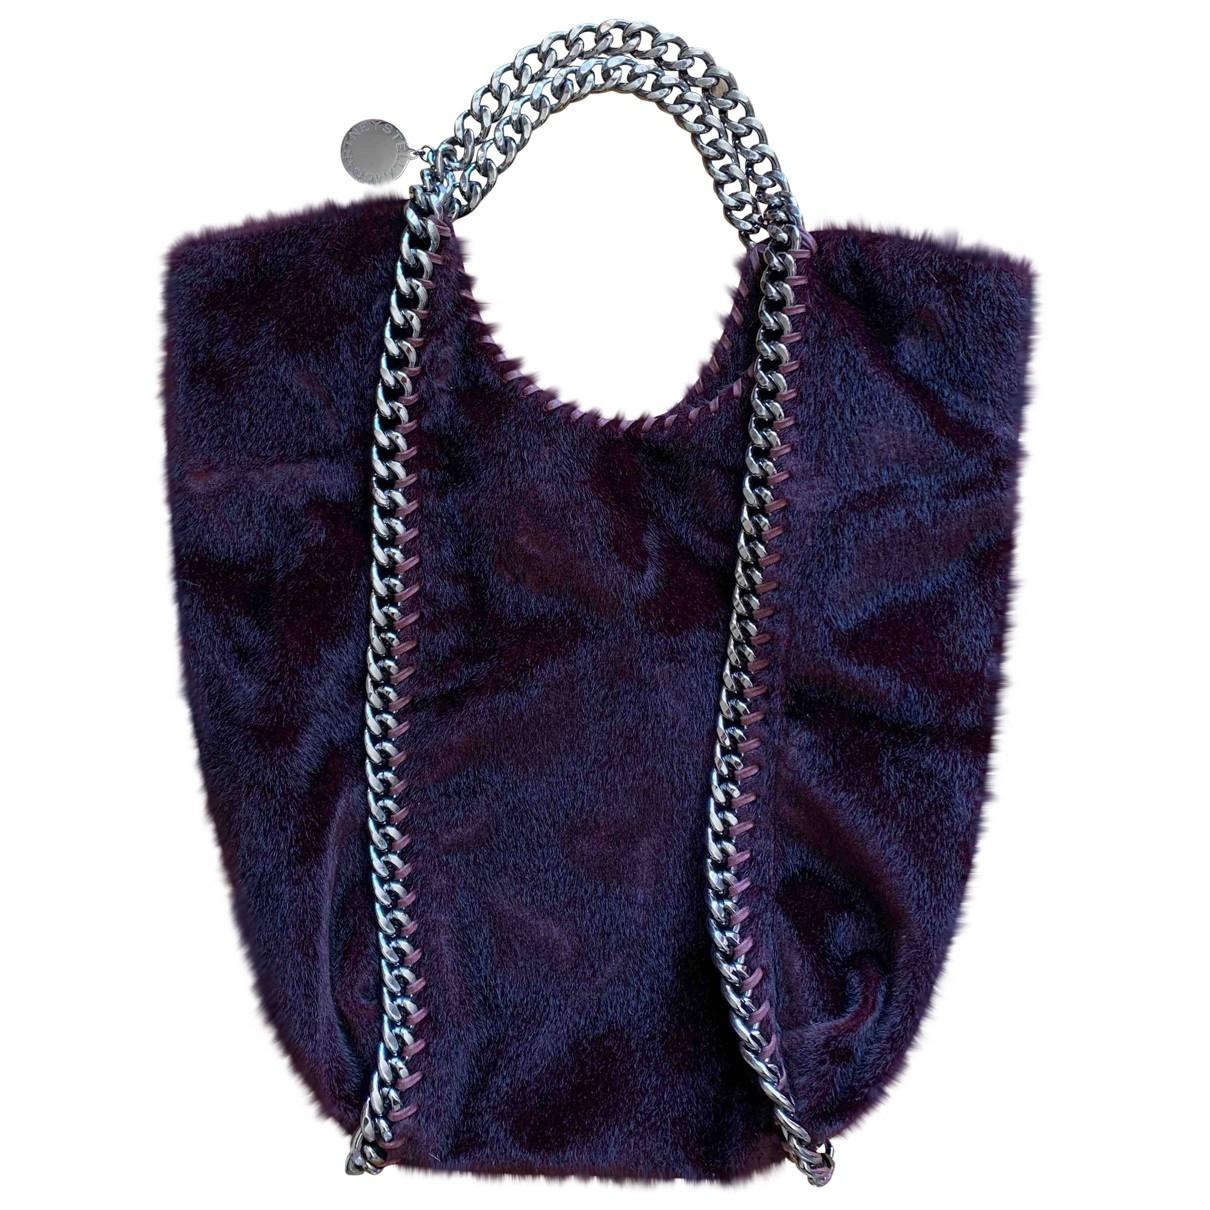 Stella Mccartney - Sac a main Falabella pour femme en toile - violet